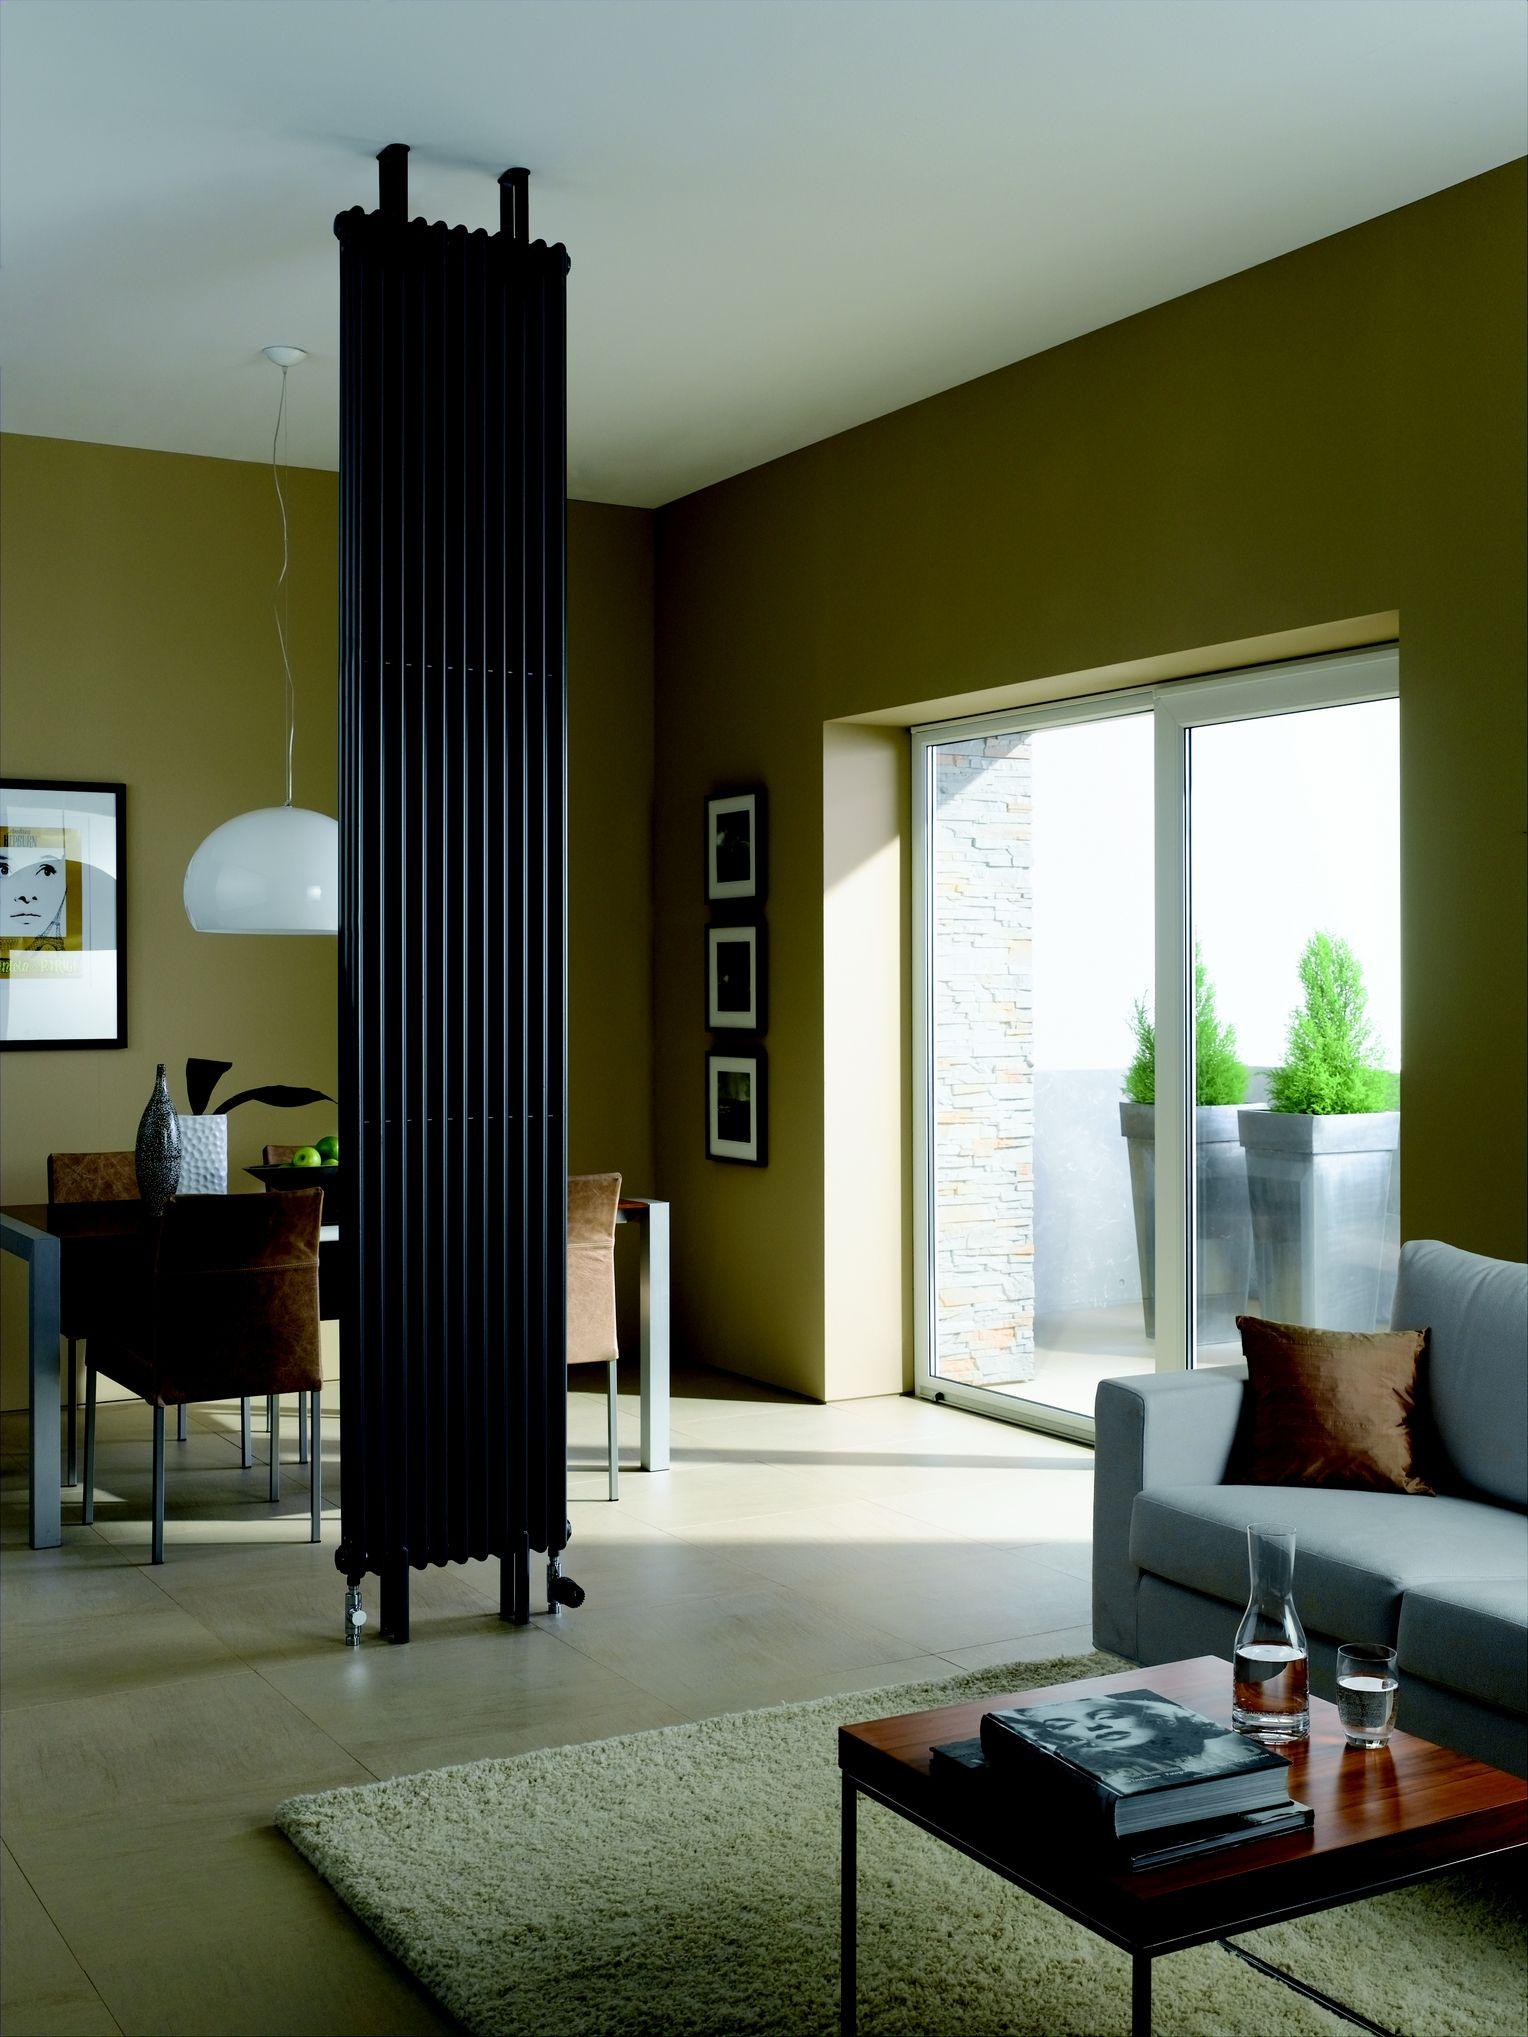 pin by varela design on radiateur design varela stylis pinterest. Black Bedroom Furniture Sets. Home Design Ideas